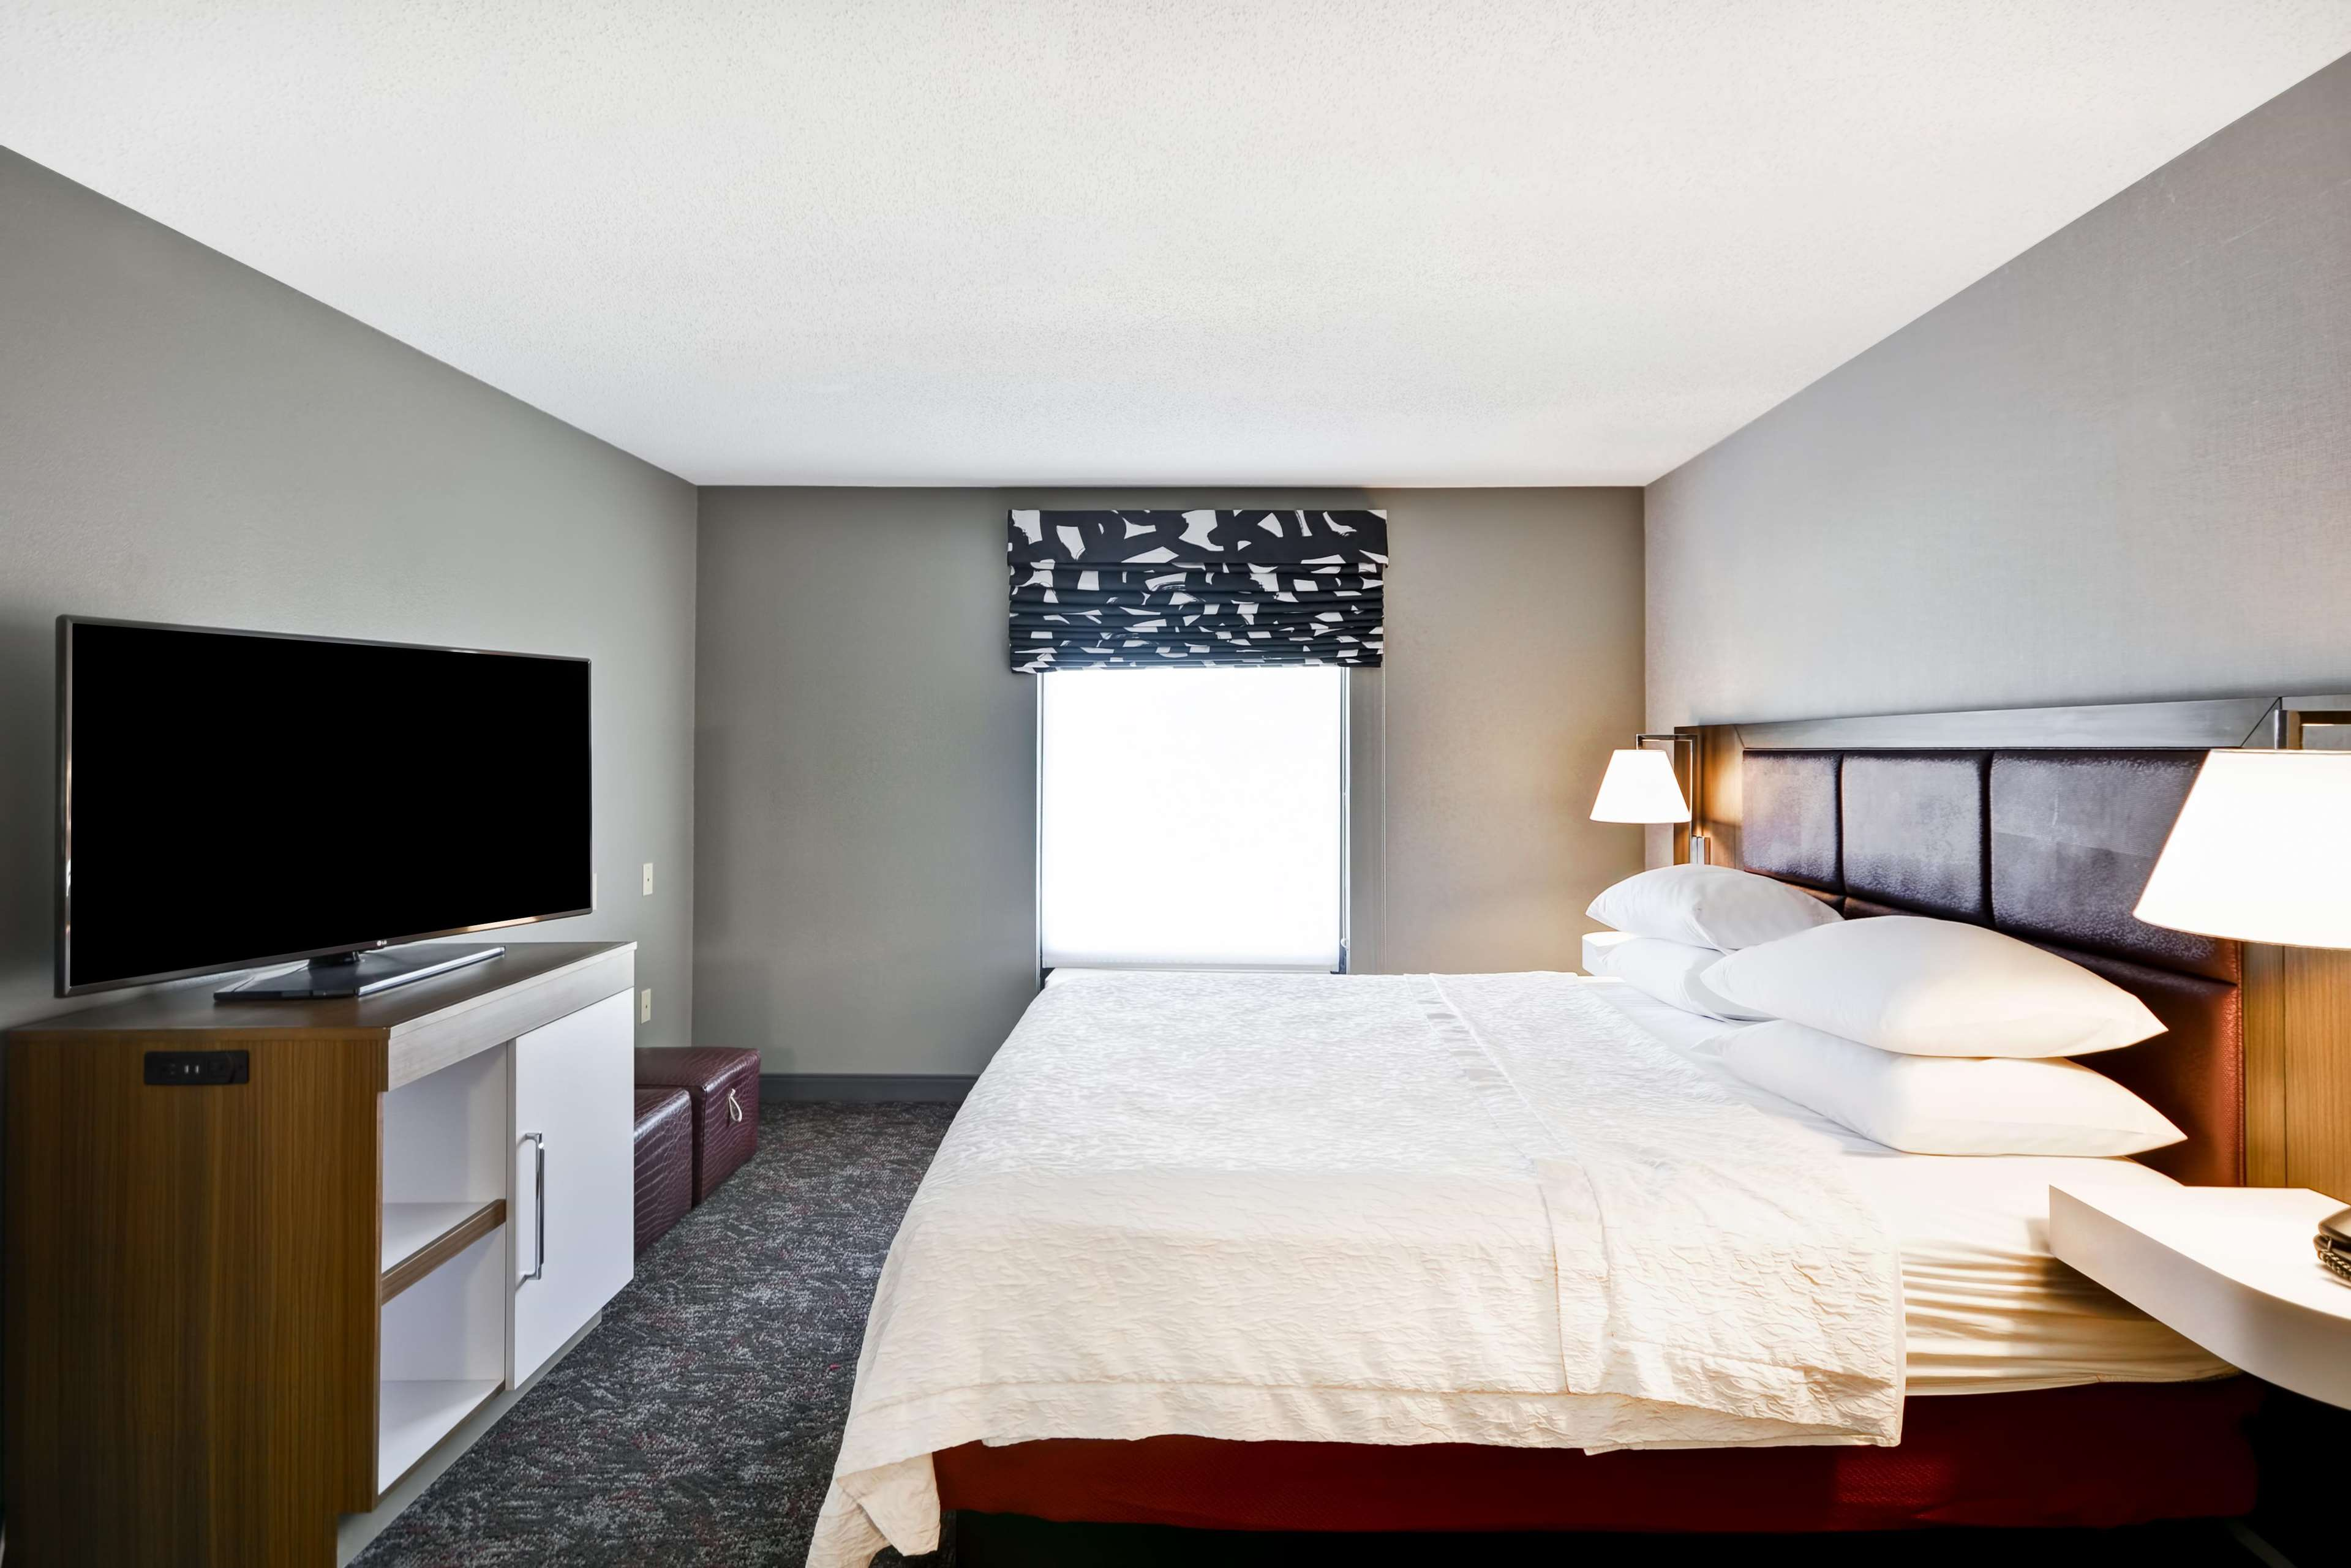 Hampton Inn & Suites Columbus-Easton Area image 41